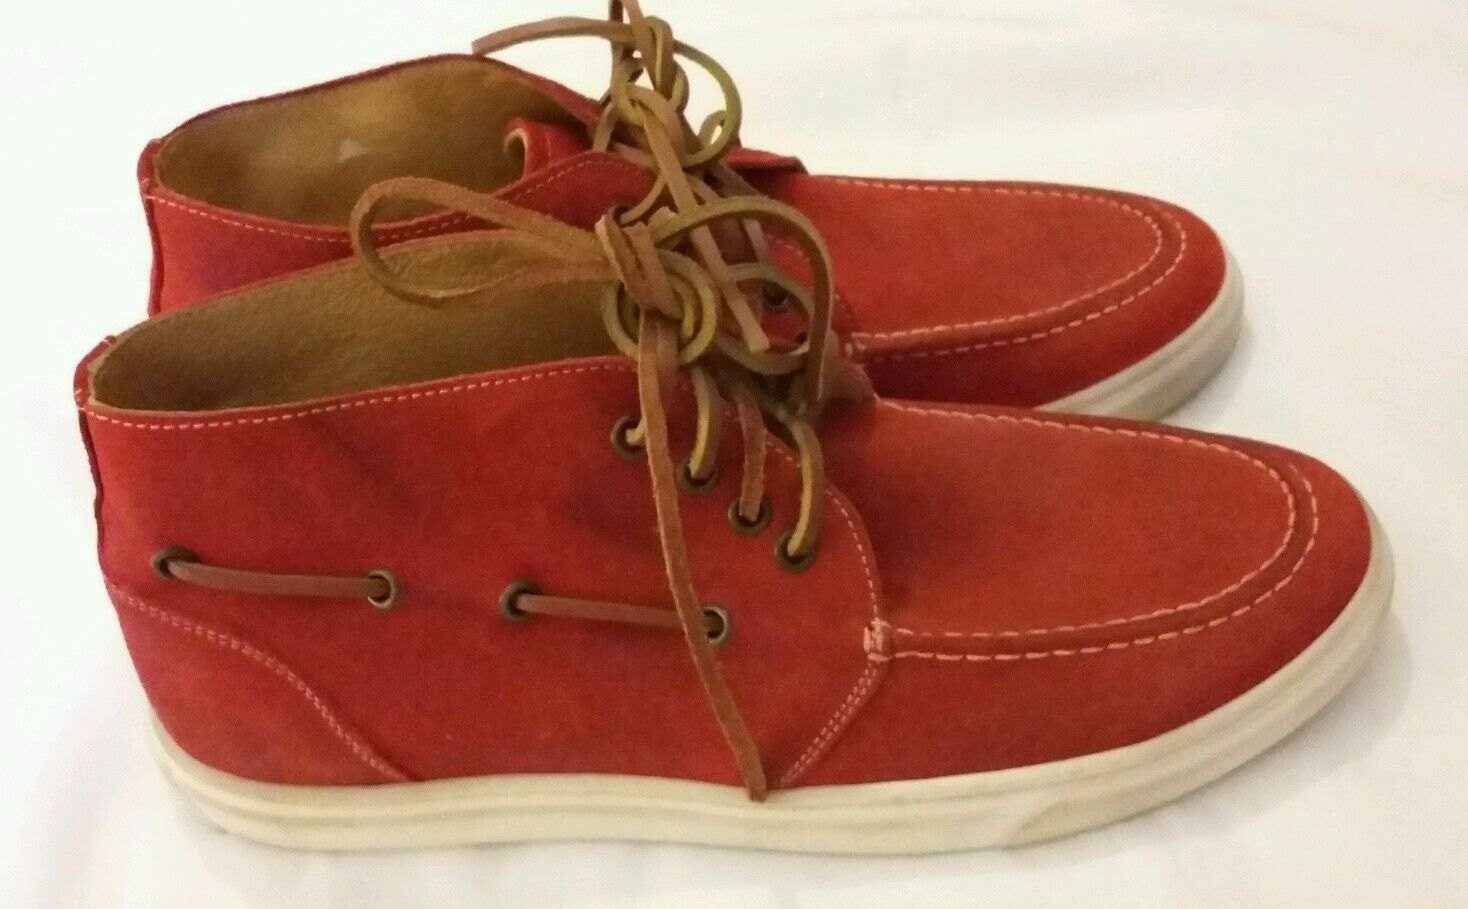 Mannersache Mannersache Mannersache by Liebeskind rot Suede leather casual schuhe UK 9 EU 43   |  | Großer Verkauf  59b3b2